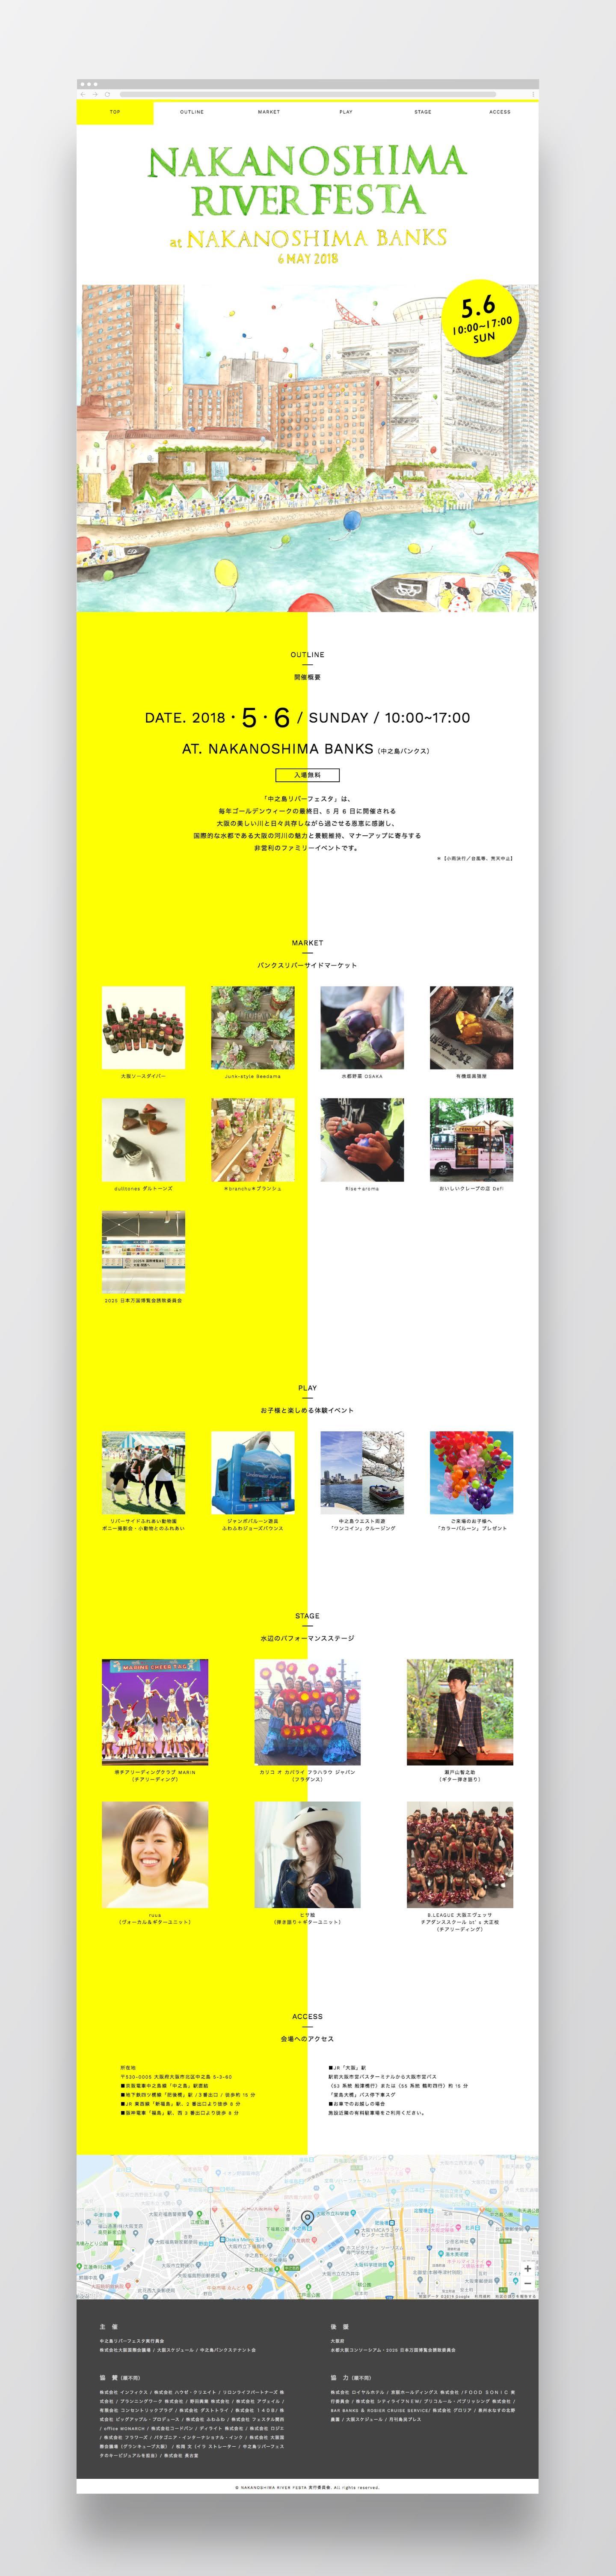 NAKANOSHIMA RIVER FESTA Web Design